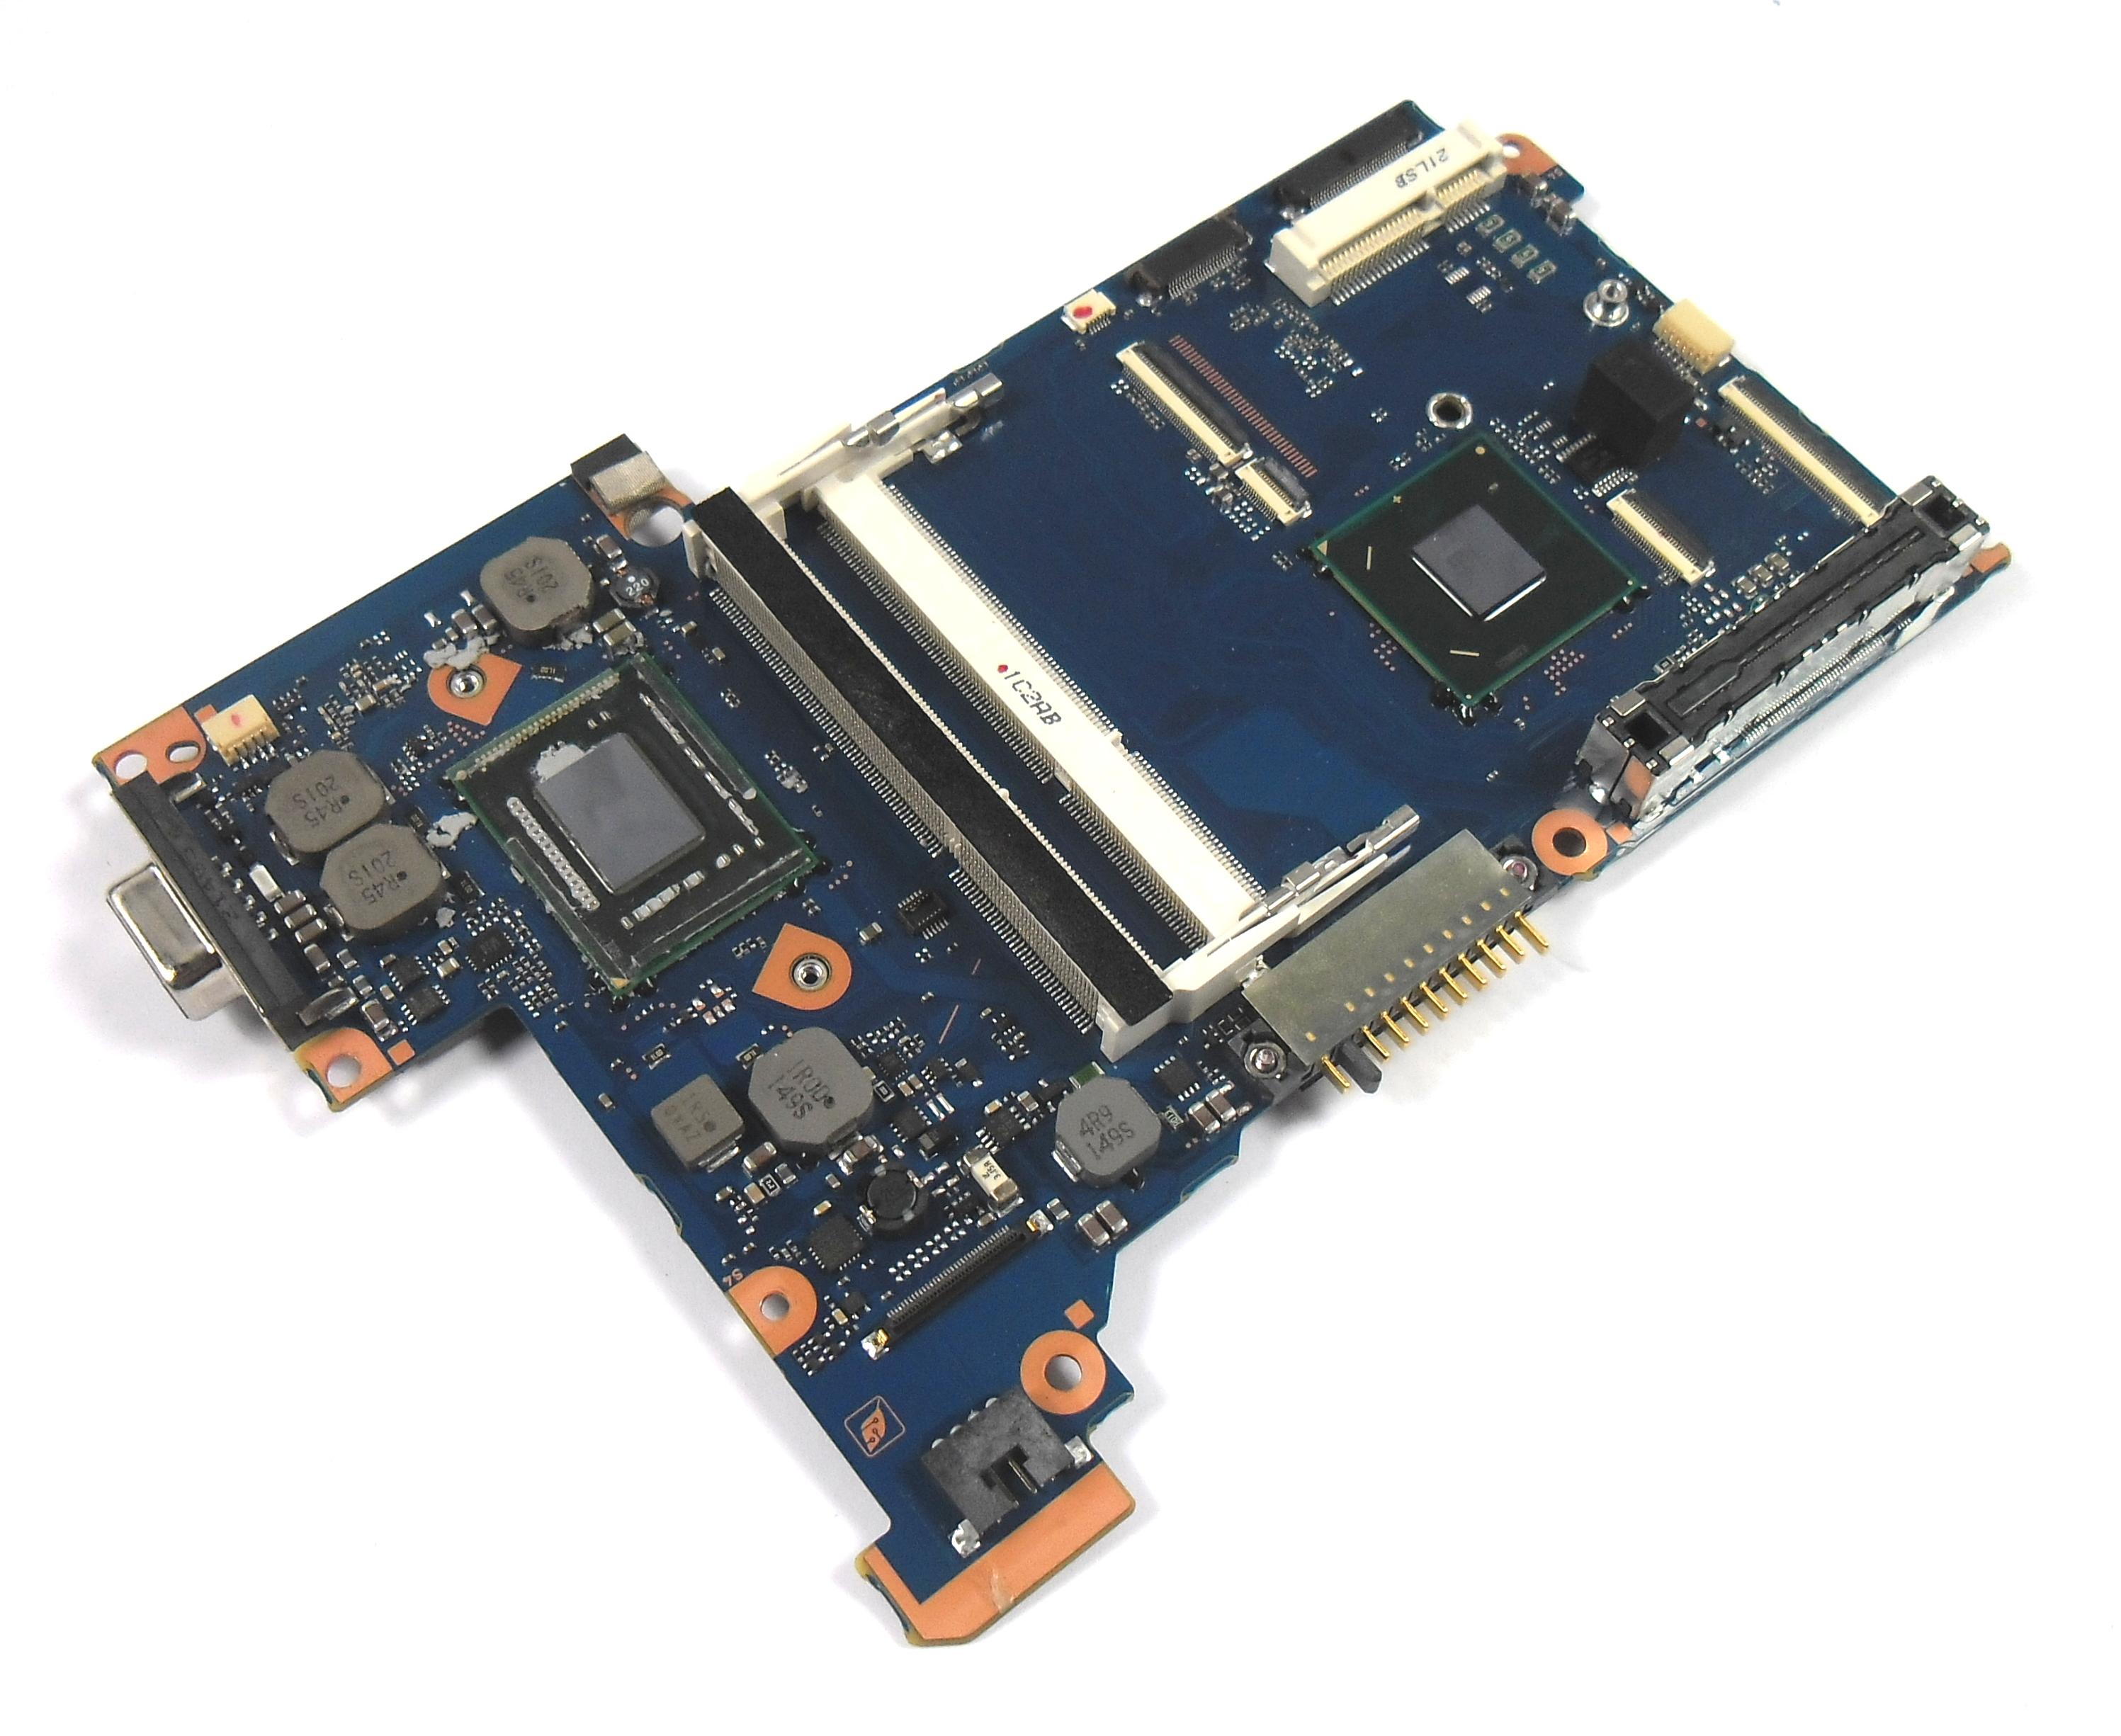 Toshiba FAL3SY3 Portege R830 Laptop Motherboard with Intel i3-2350M Processor